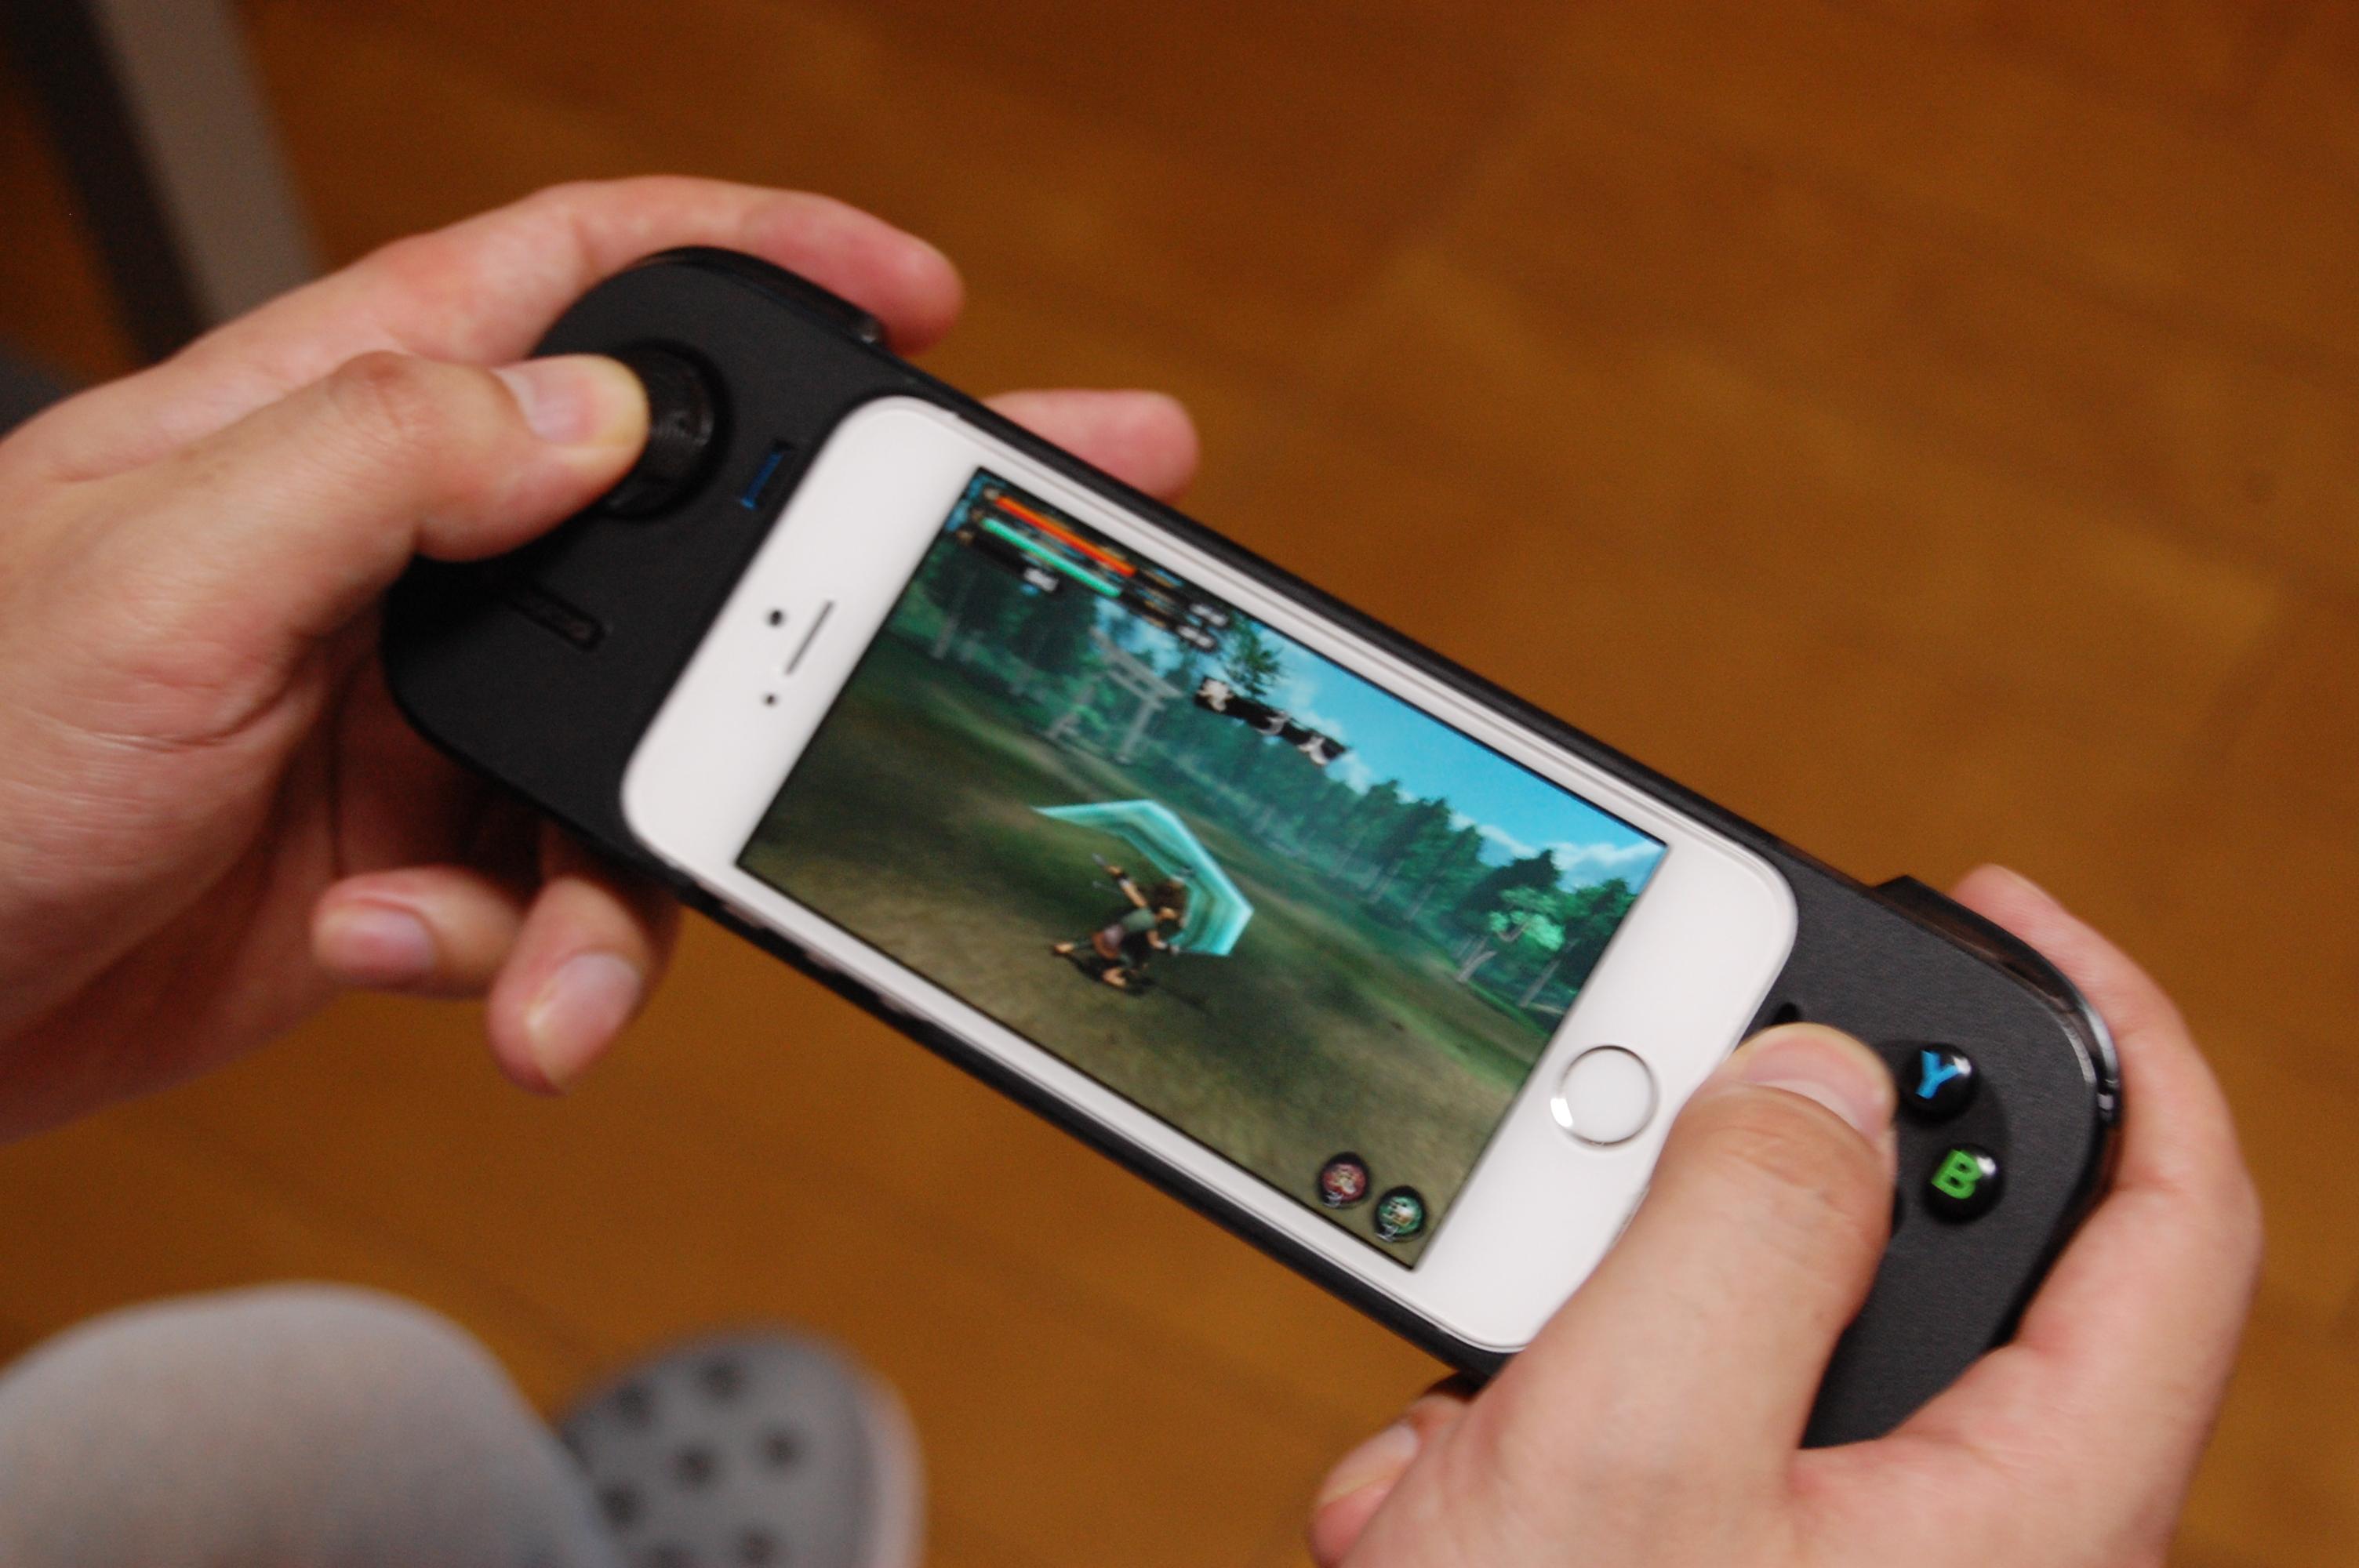 「Logicool® G550 Powershell controller + battery」のようなスマートフォン向けゲームパッドにも対応!